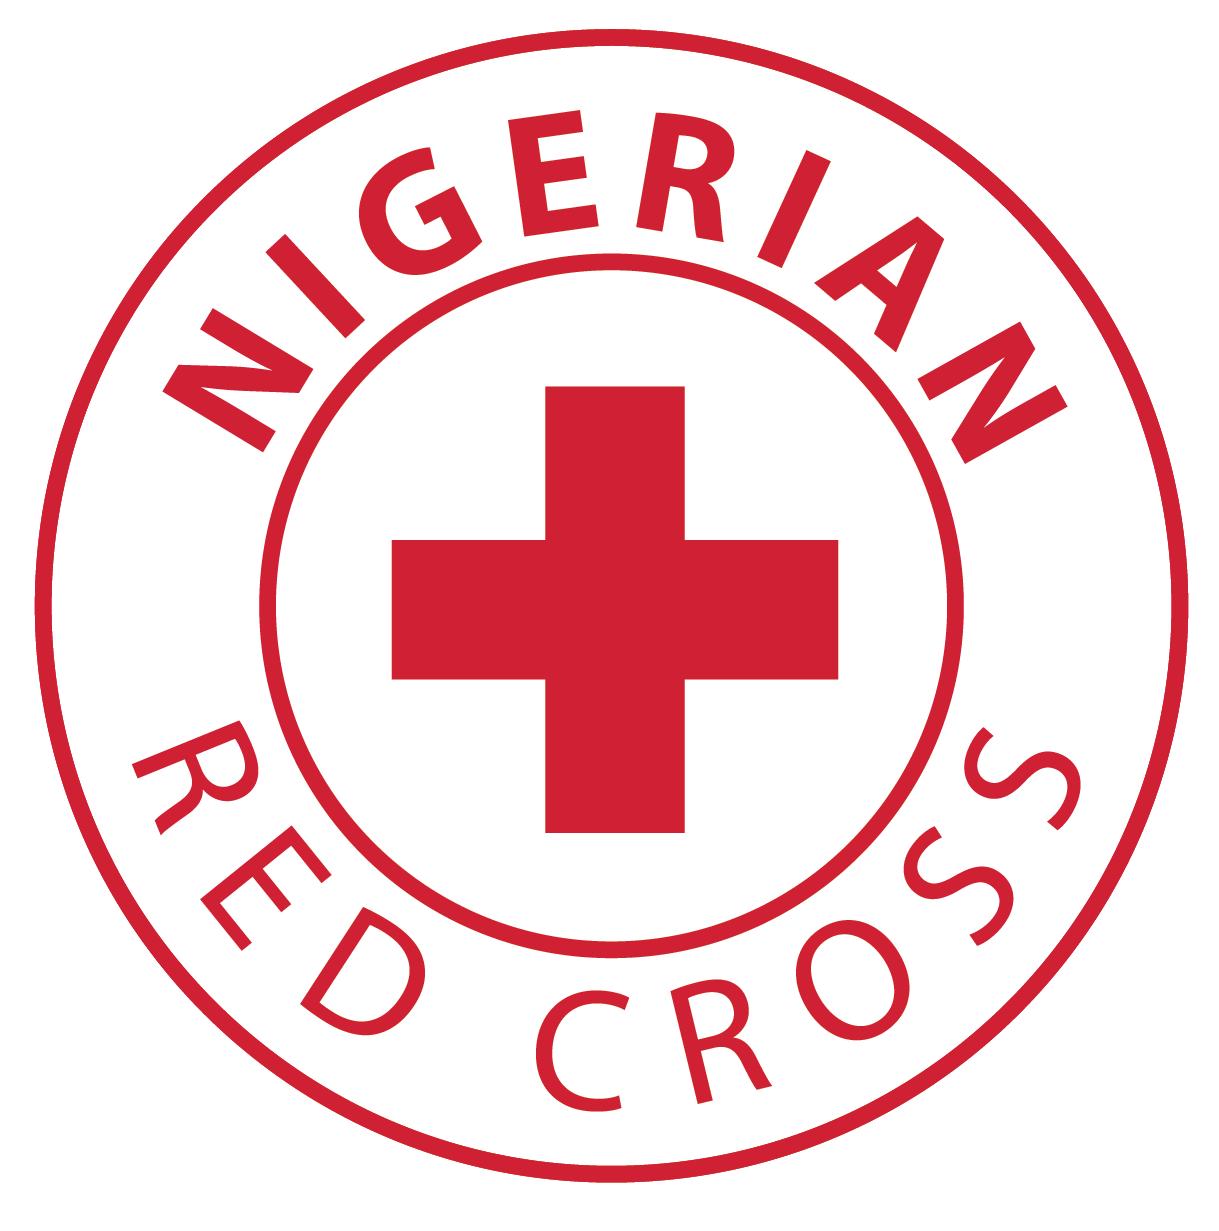 Nigerian Red Cross